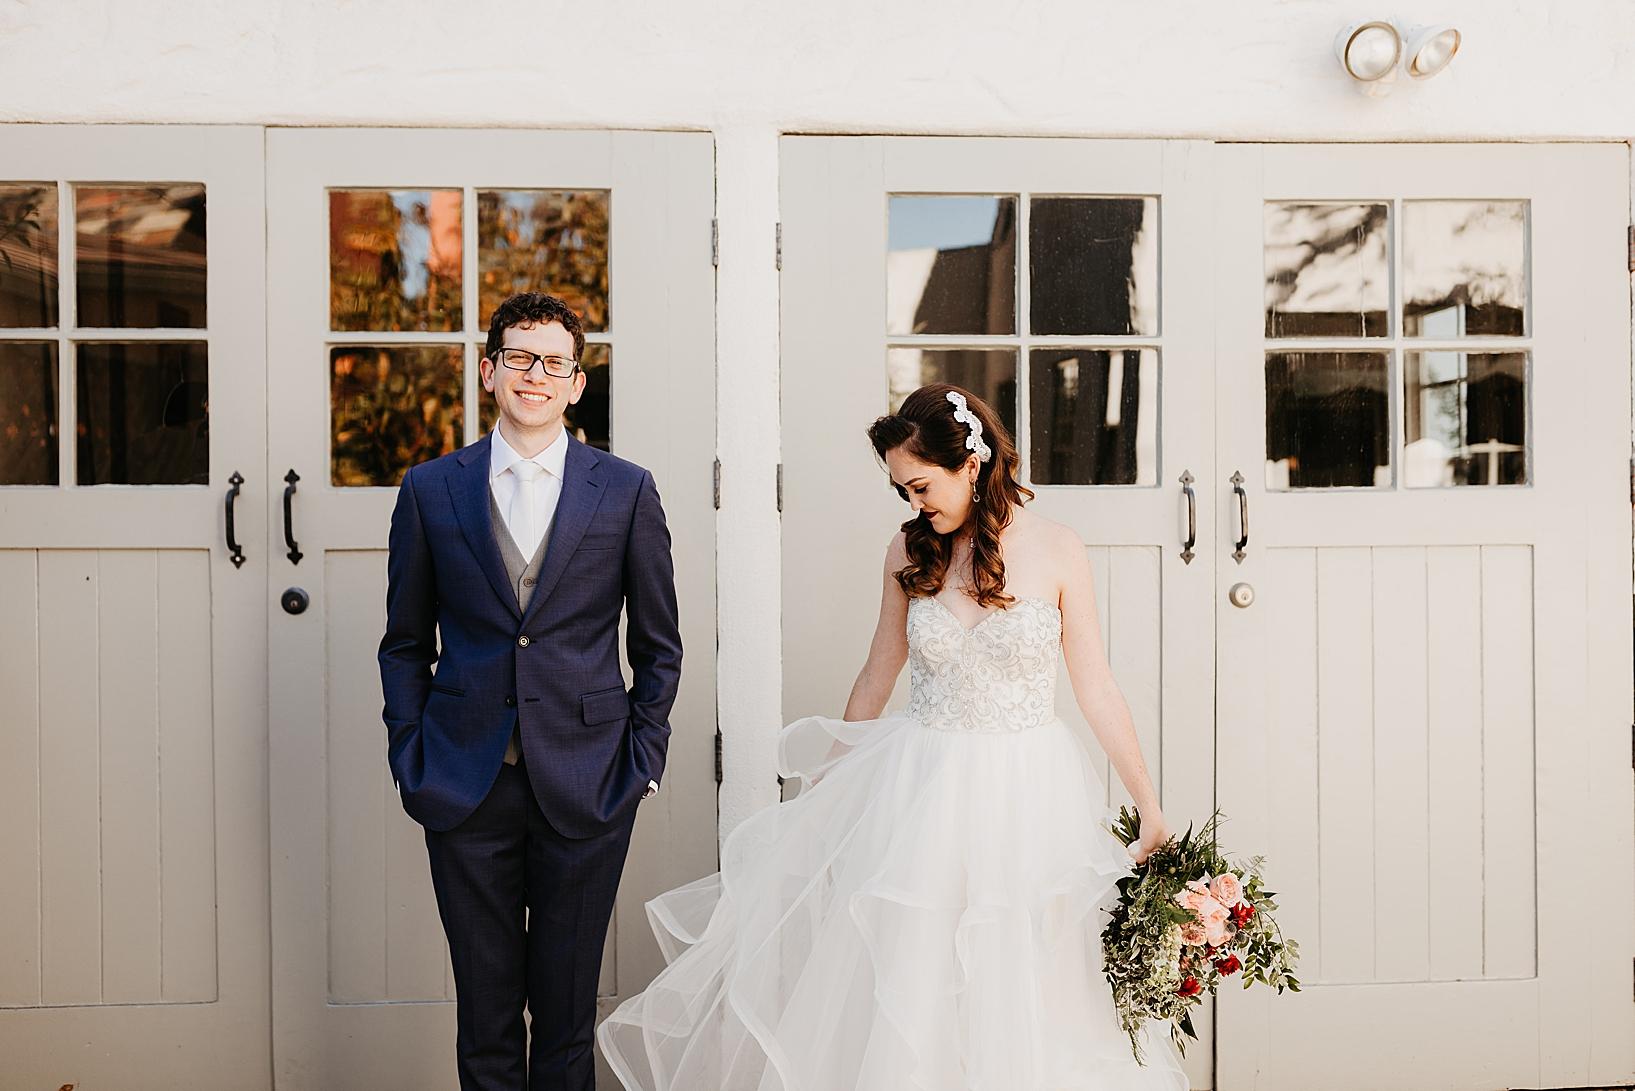 Brick-San-Diego-Winter-Wedding-18.jpg